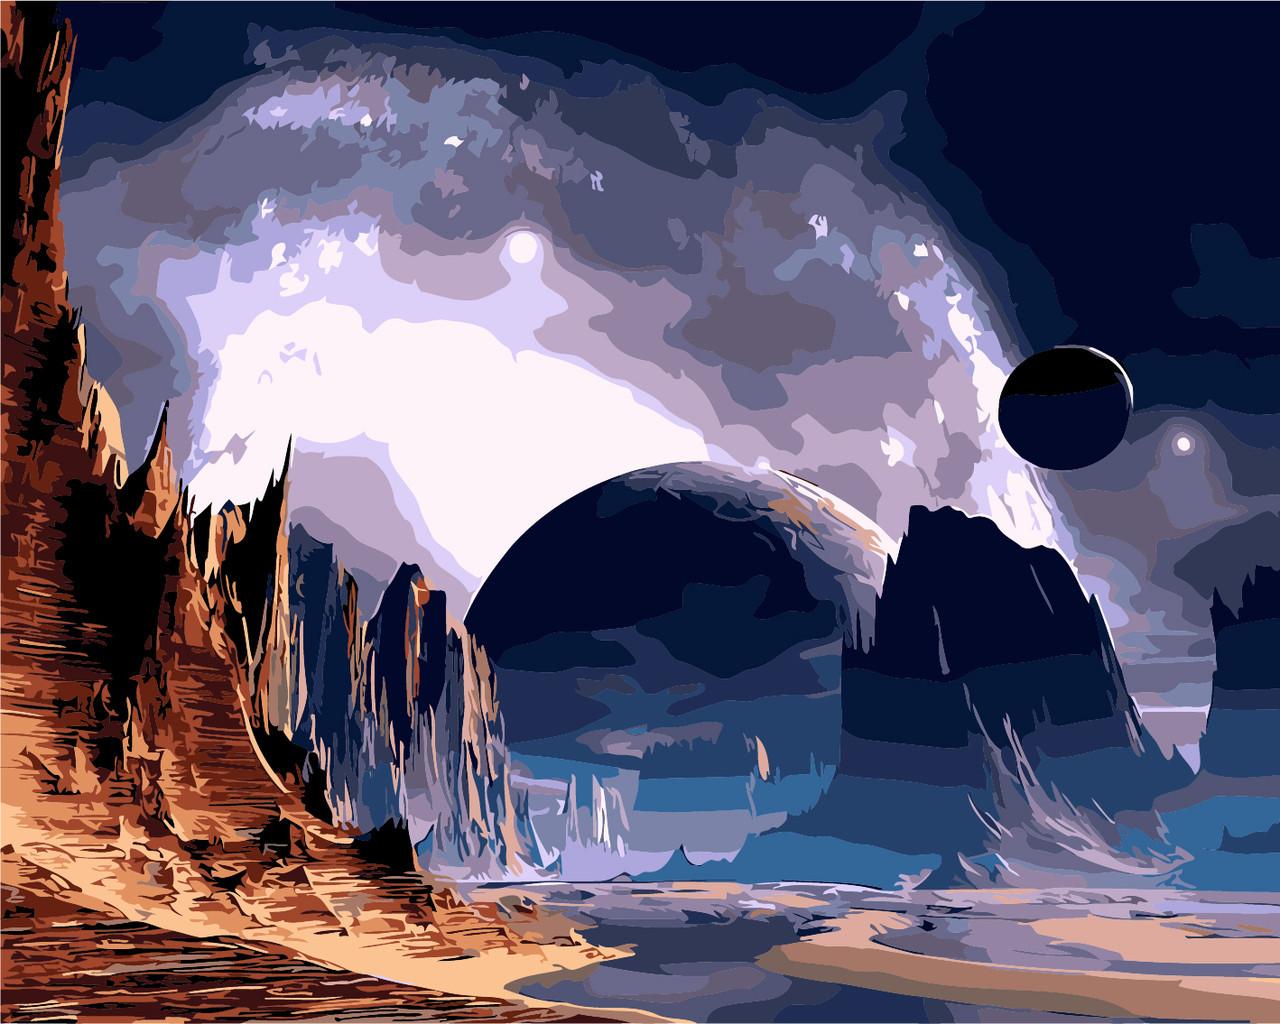 Картина по номерам Далекая планета 40 х 50 см (AS0264)